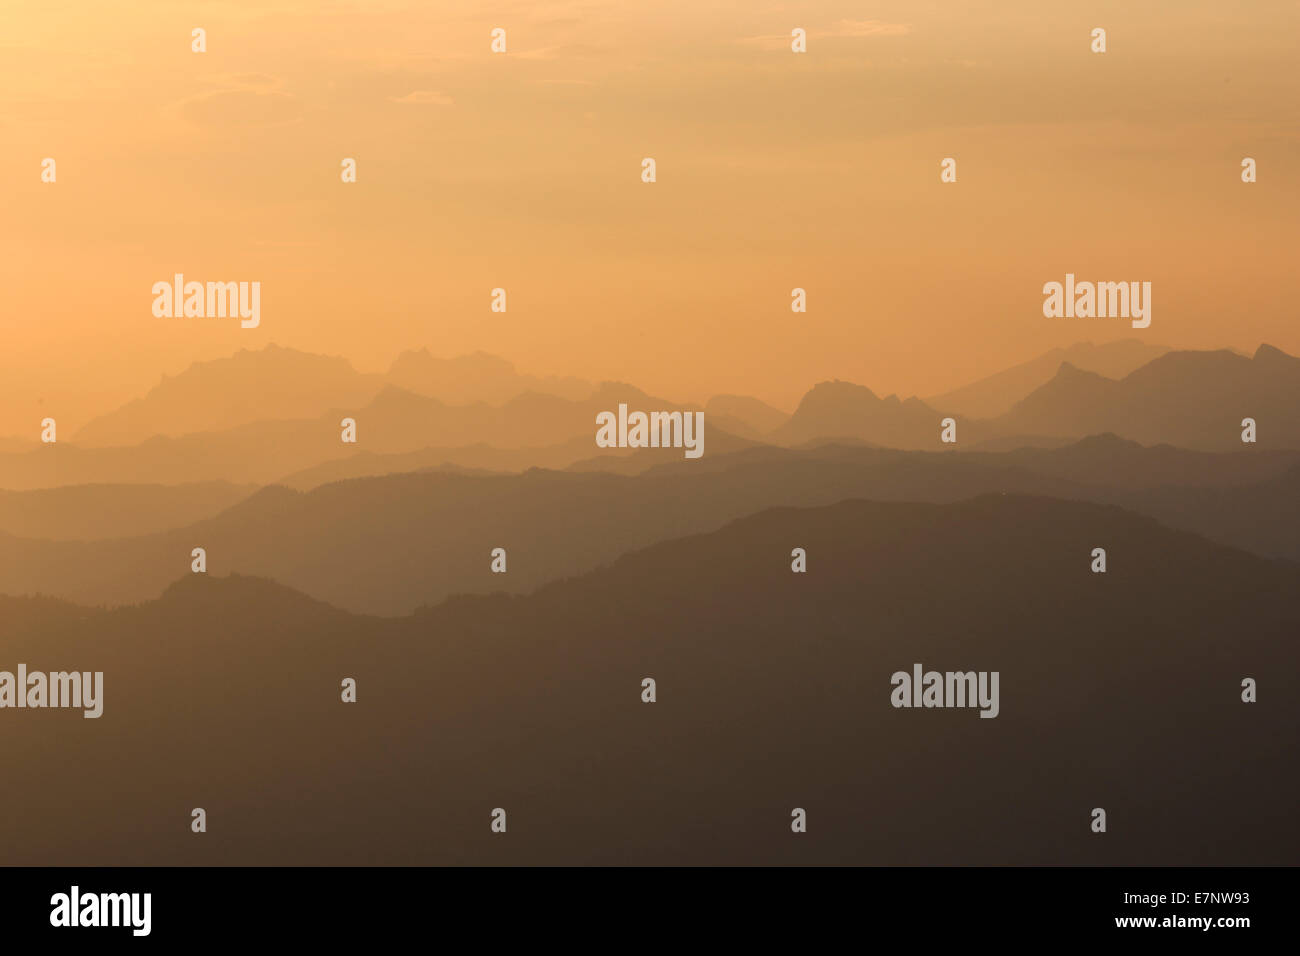 Alps, rising, view, view from Pilatus, mountain, mountain panorama, mountains, mist, background, morning, panorama, - Stock Image